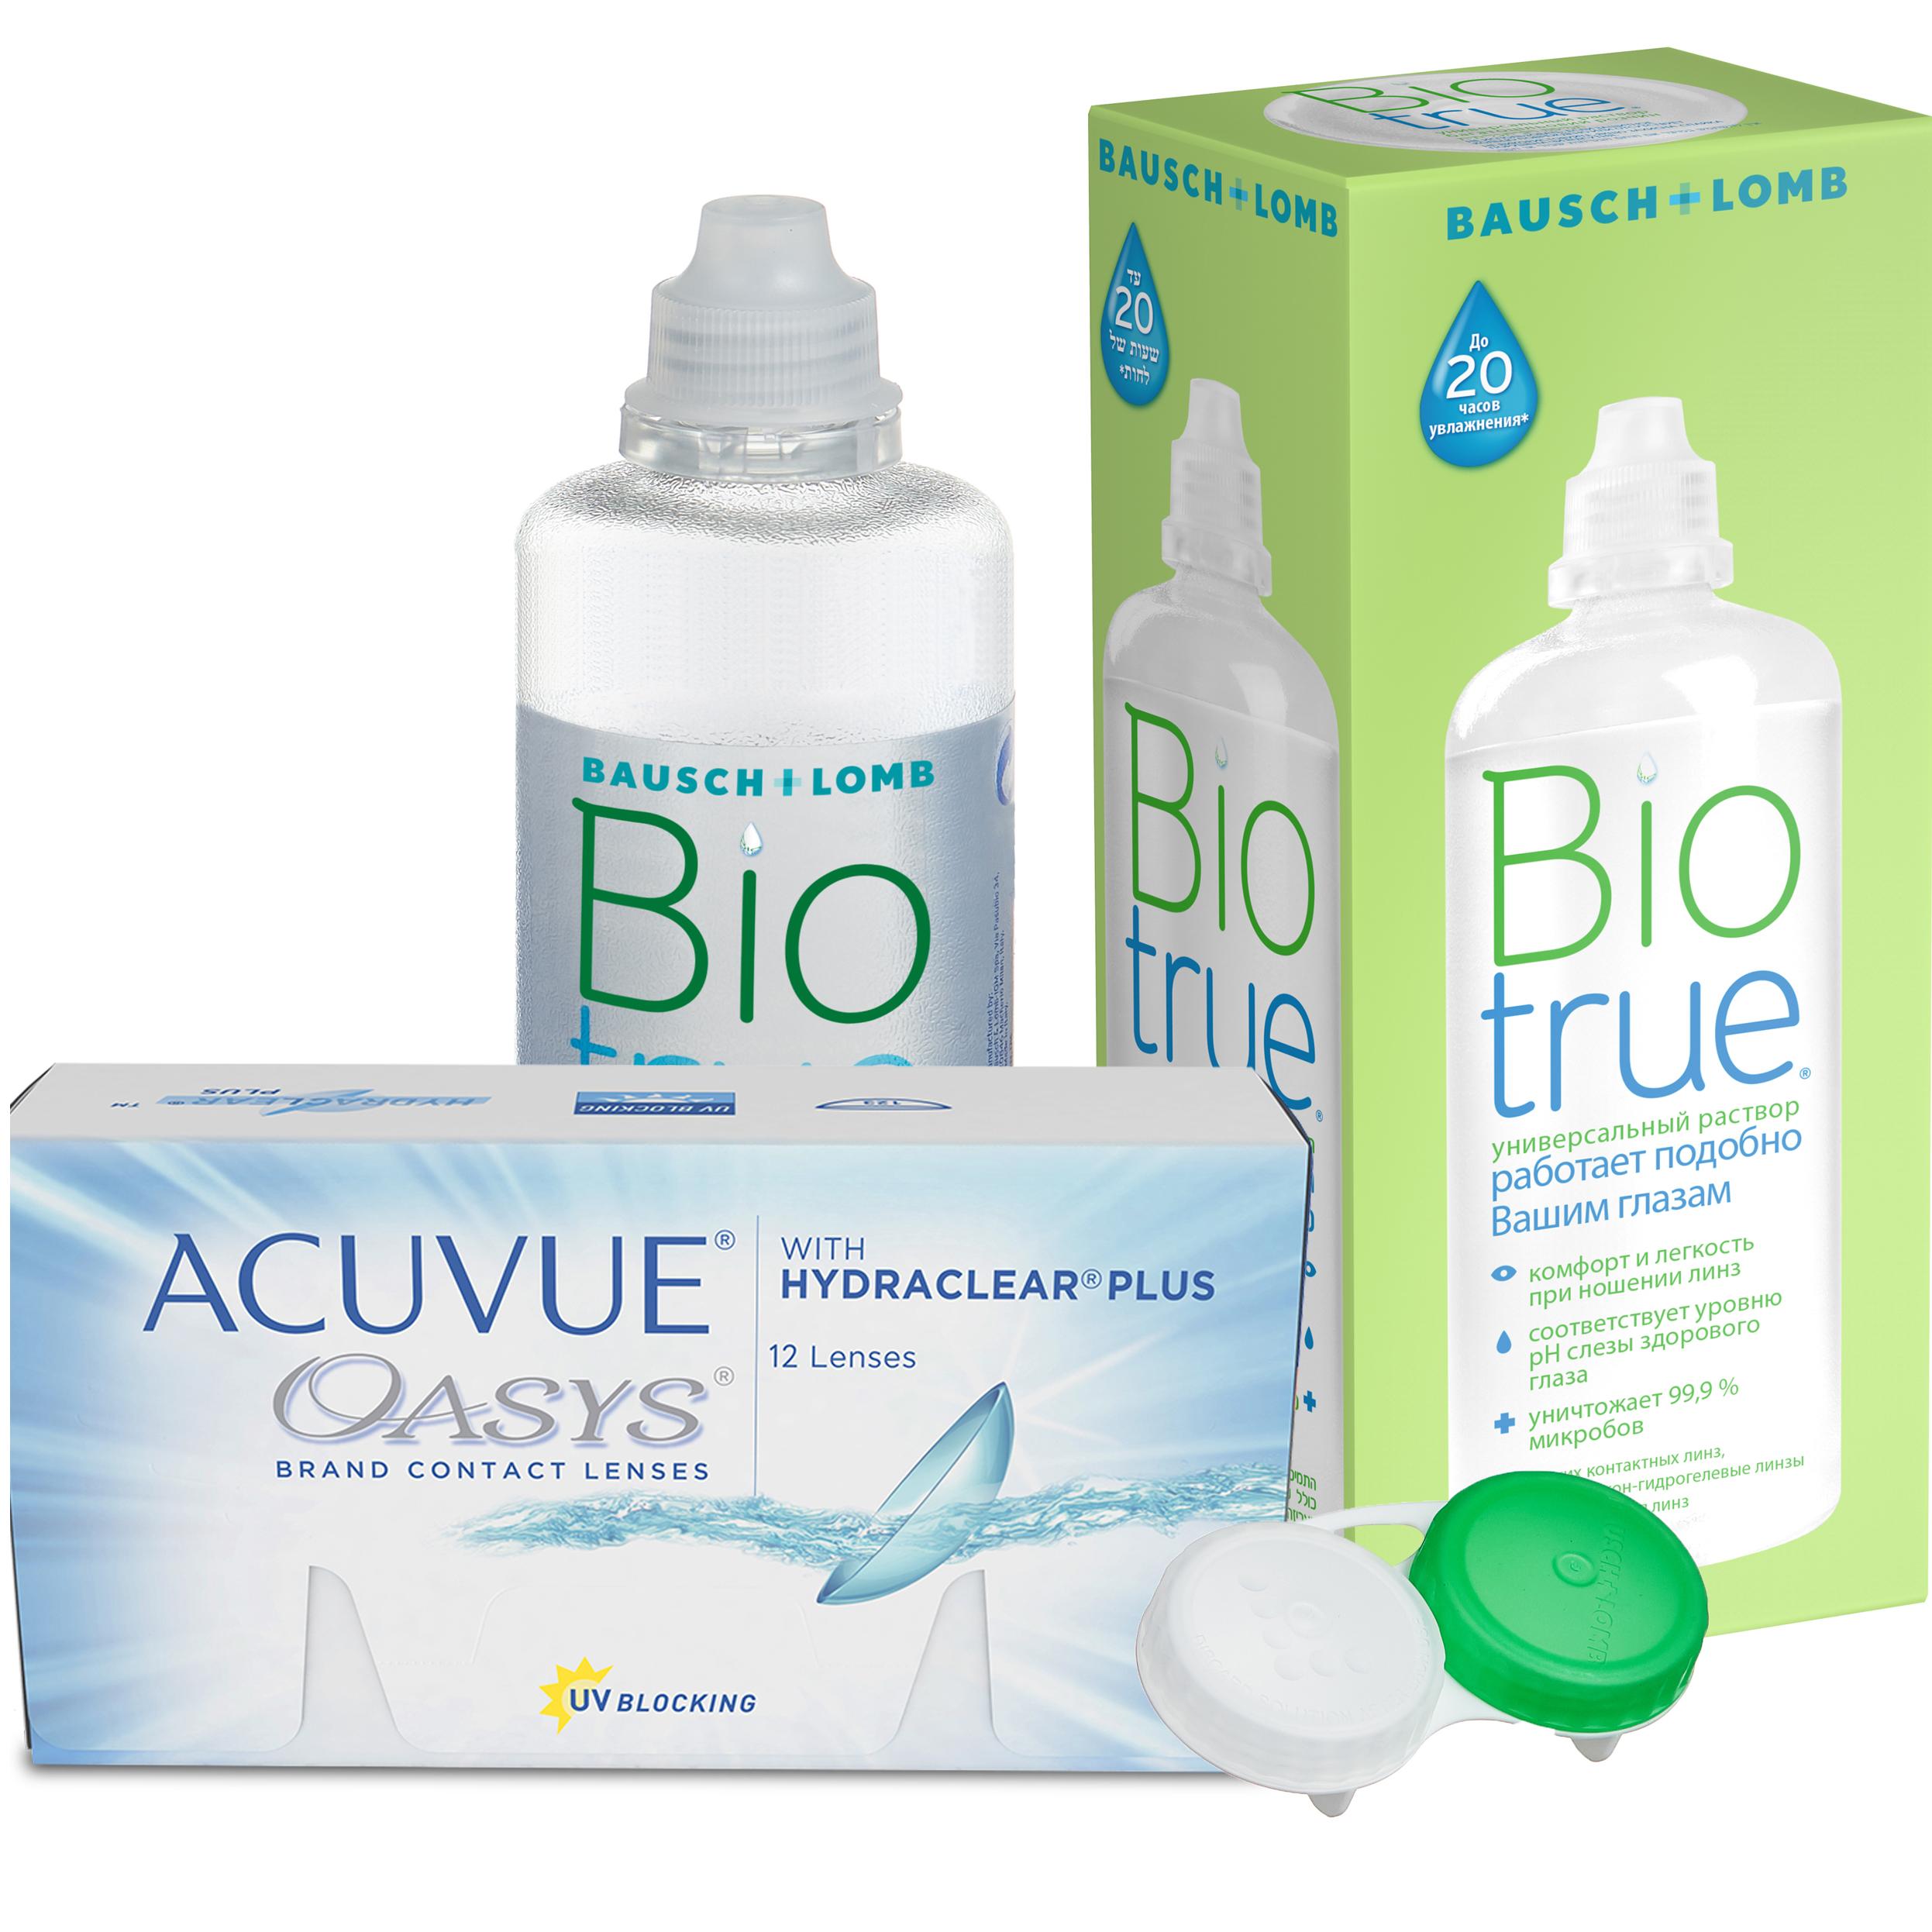 Купить Oasys with Hydraclear Plus 12 линз + Biotrue, Контактные линзы Acuvue Oasys with Hydraclear Plus 12 линз R 8.4 +1, 75 + Biotrue 300 мл